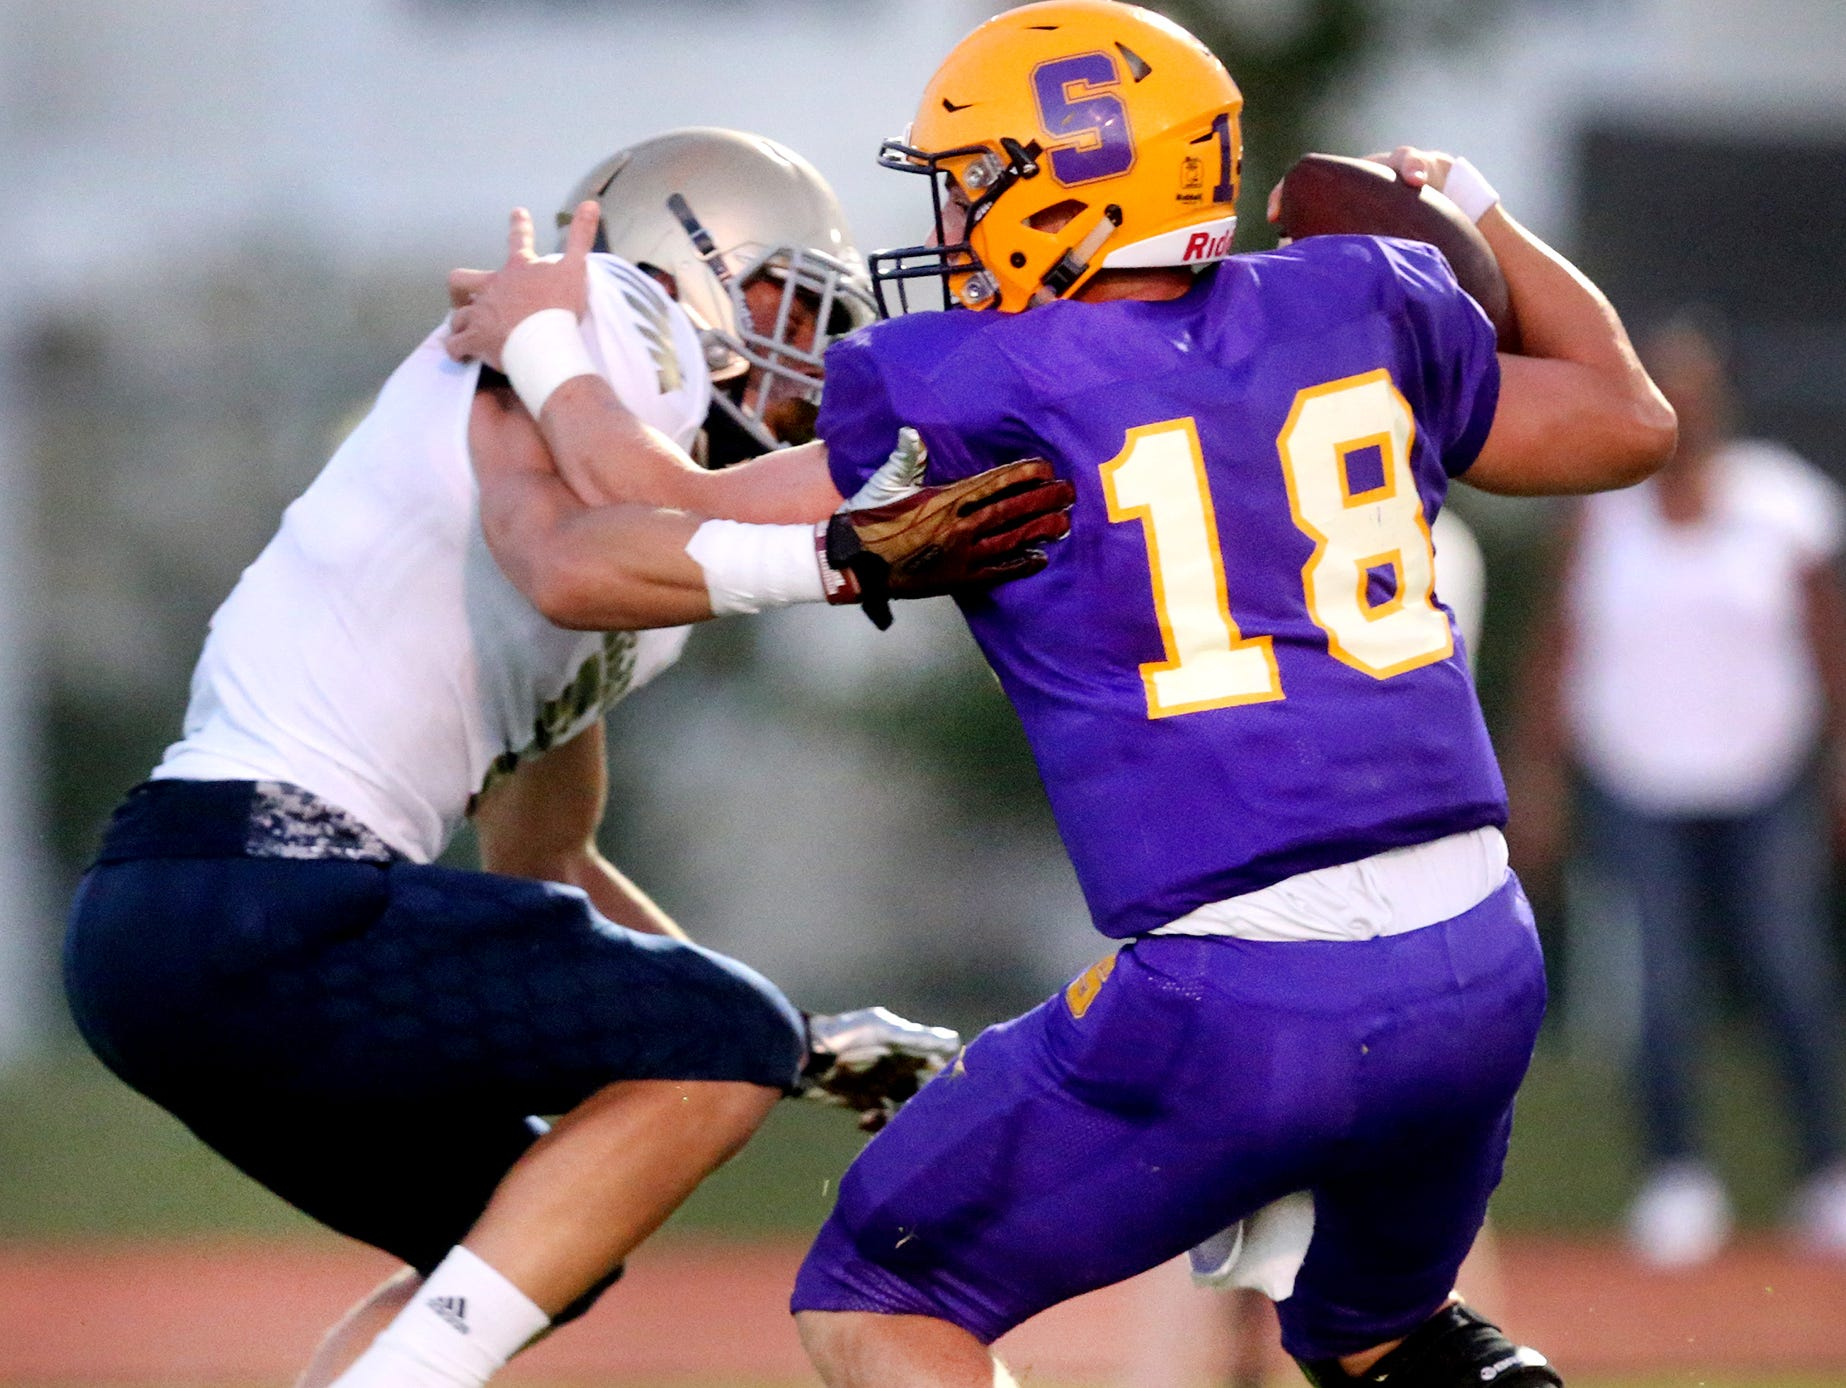 Smyrna's quarterback John Turner (18) tries to run the ball as Independence's Landon Guidry (7) sacks him on Friday, Sept. 9, 2016, at Smyrna.